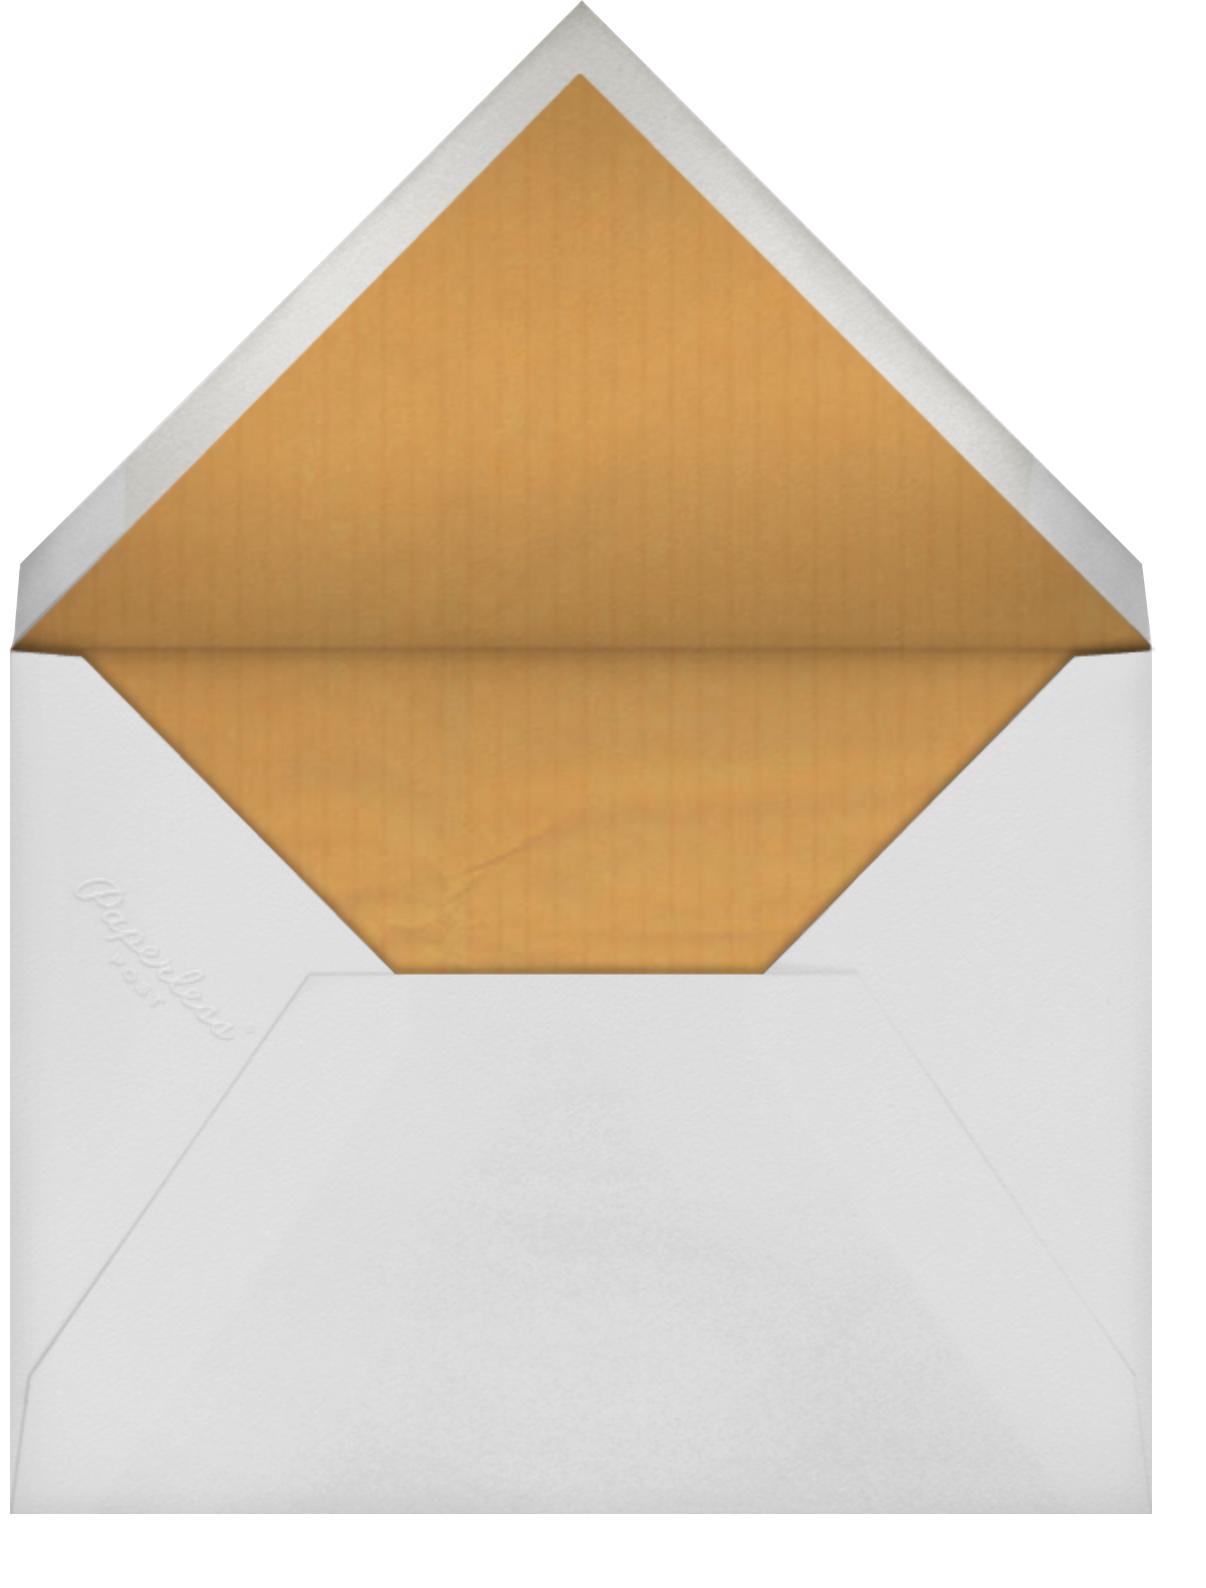 Tender Buttons - Indigo - Anthropologie - Envelope